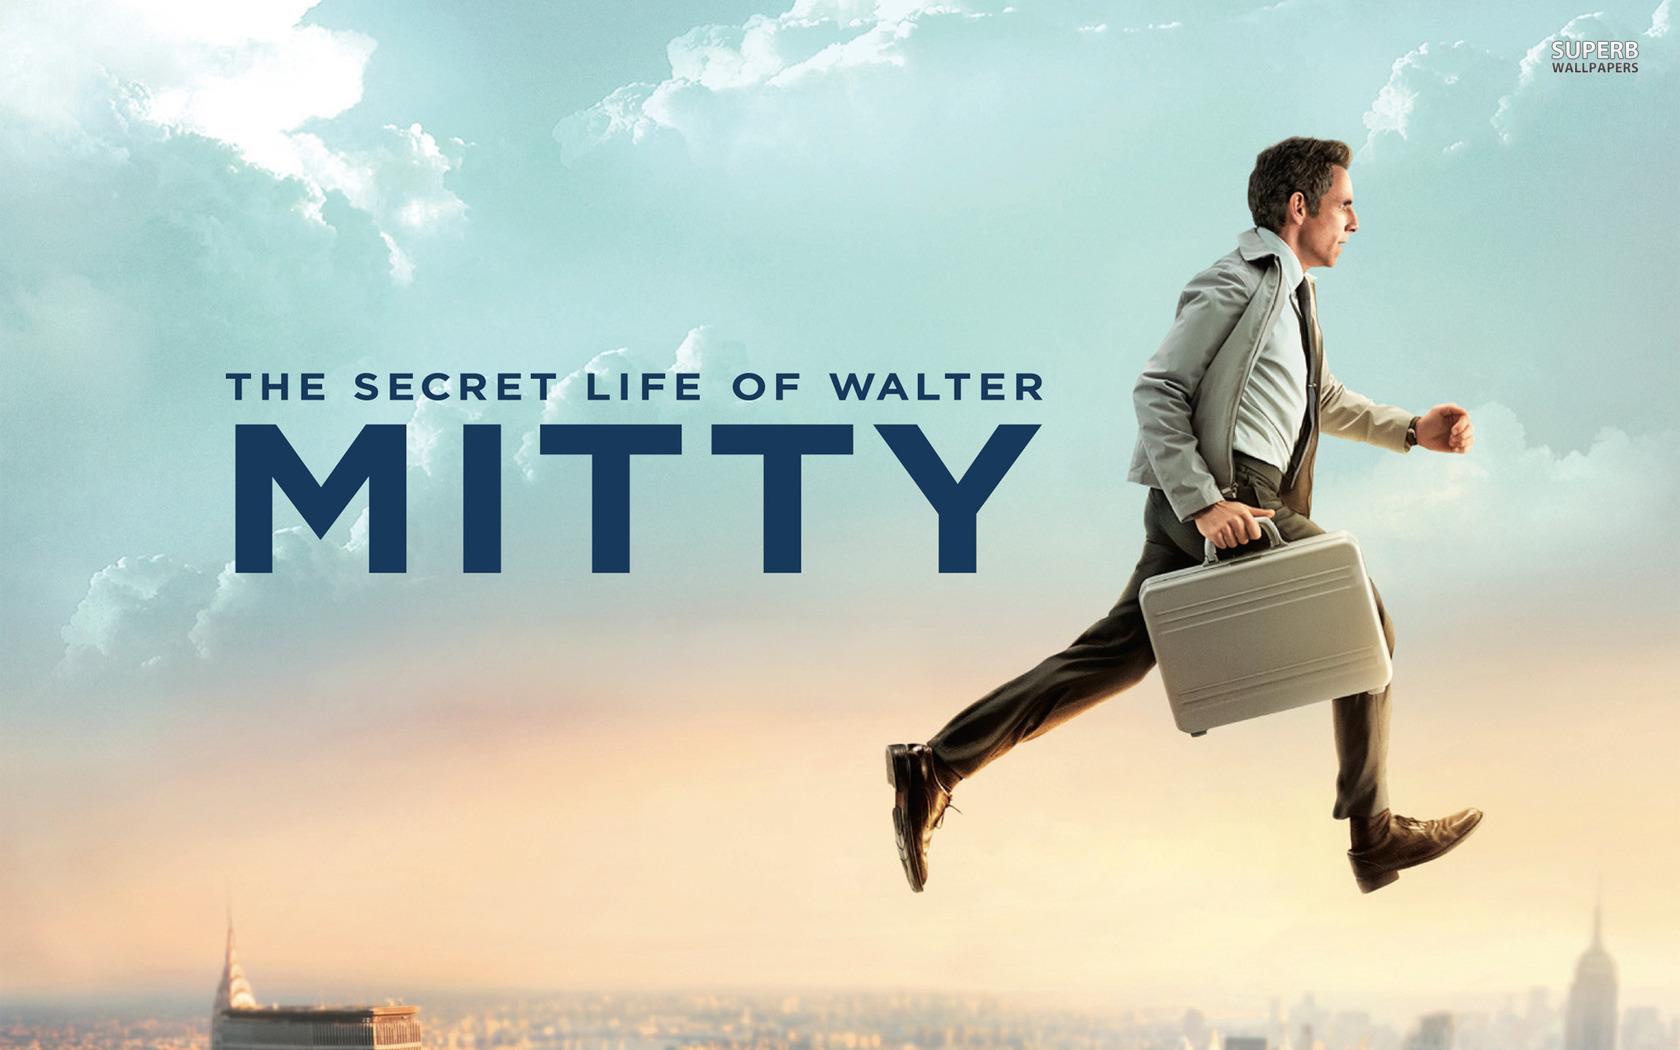 Reis inspiratie films - secret life of walter mitty